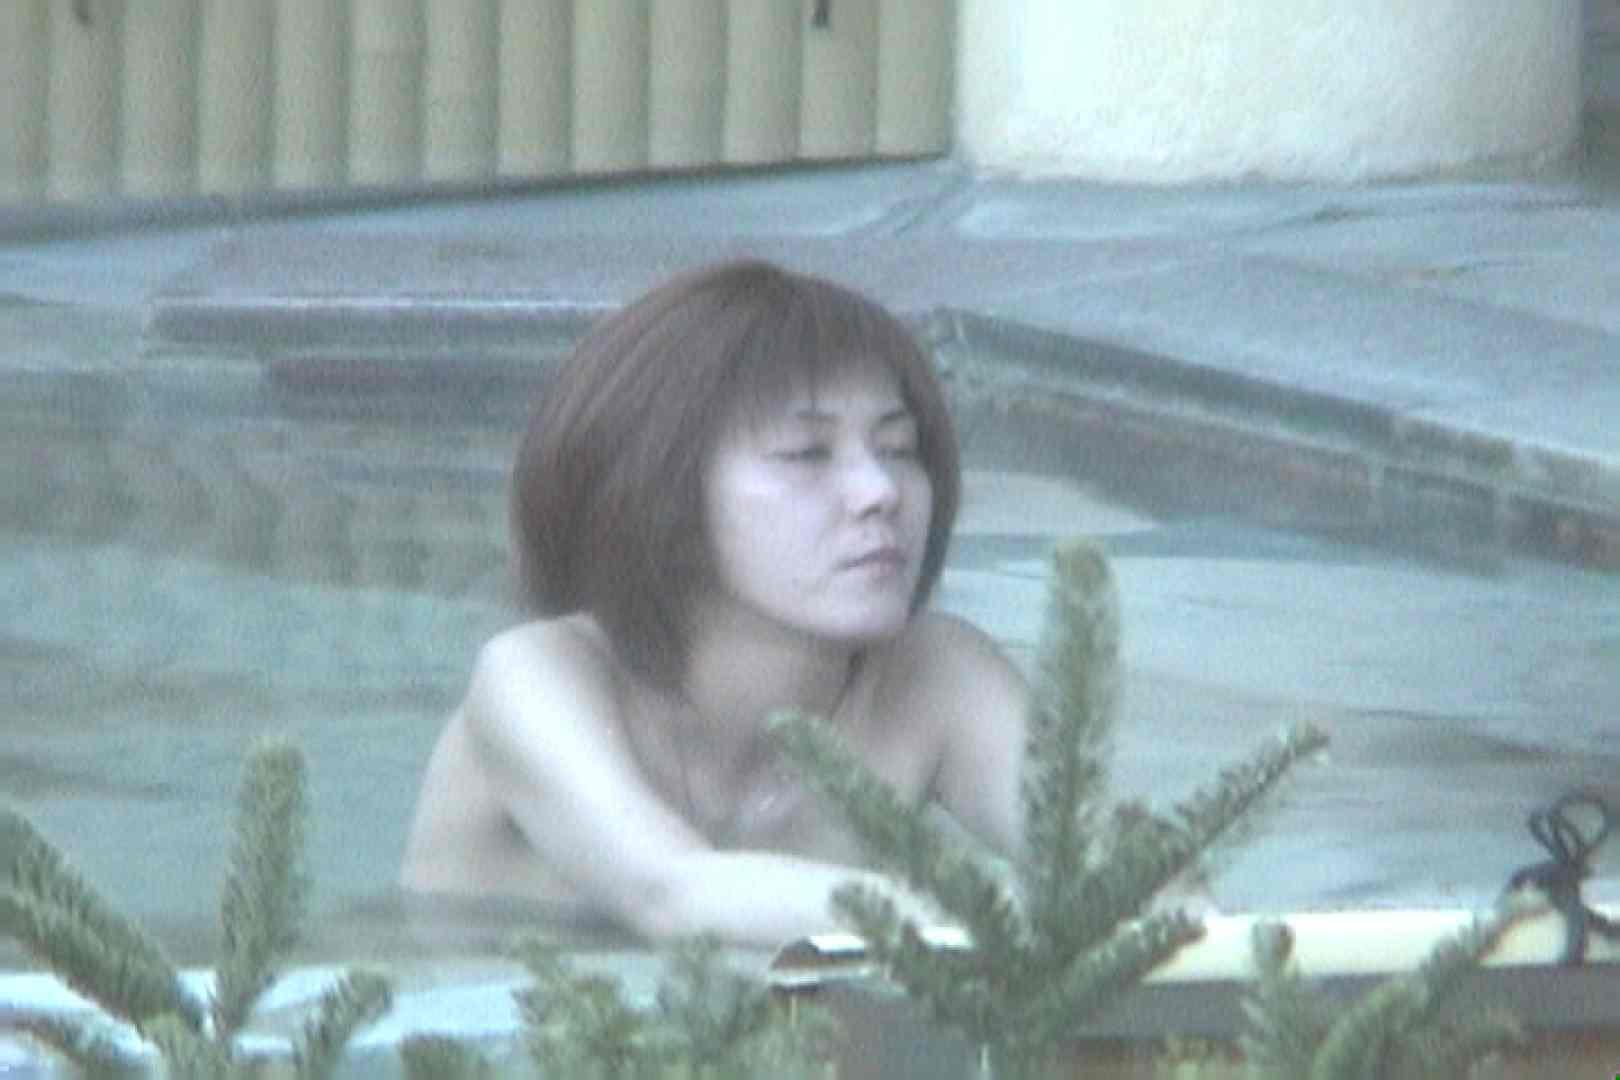 Aquaな露天風呂Vol.560 OLのエロ生活 オマンコ無修正動画無料 46連発 23